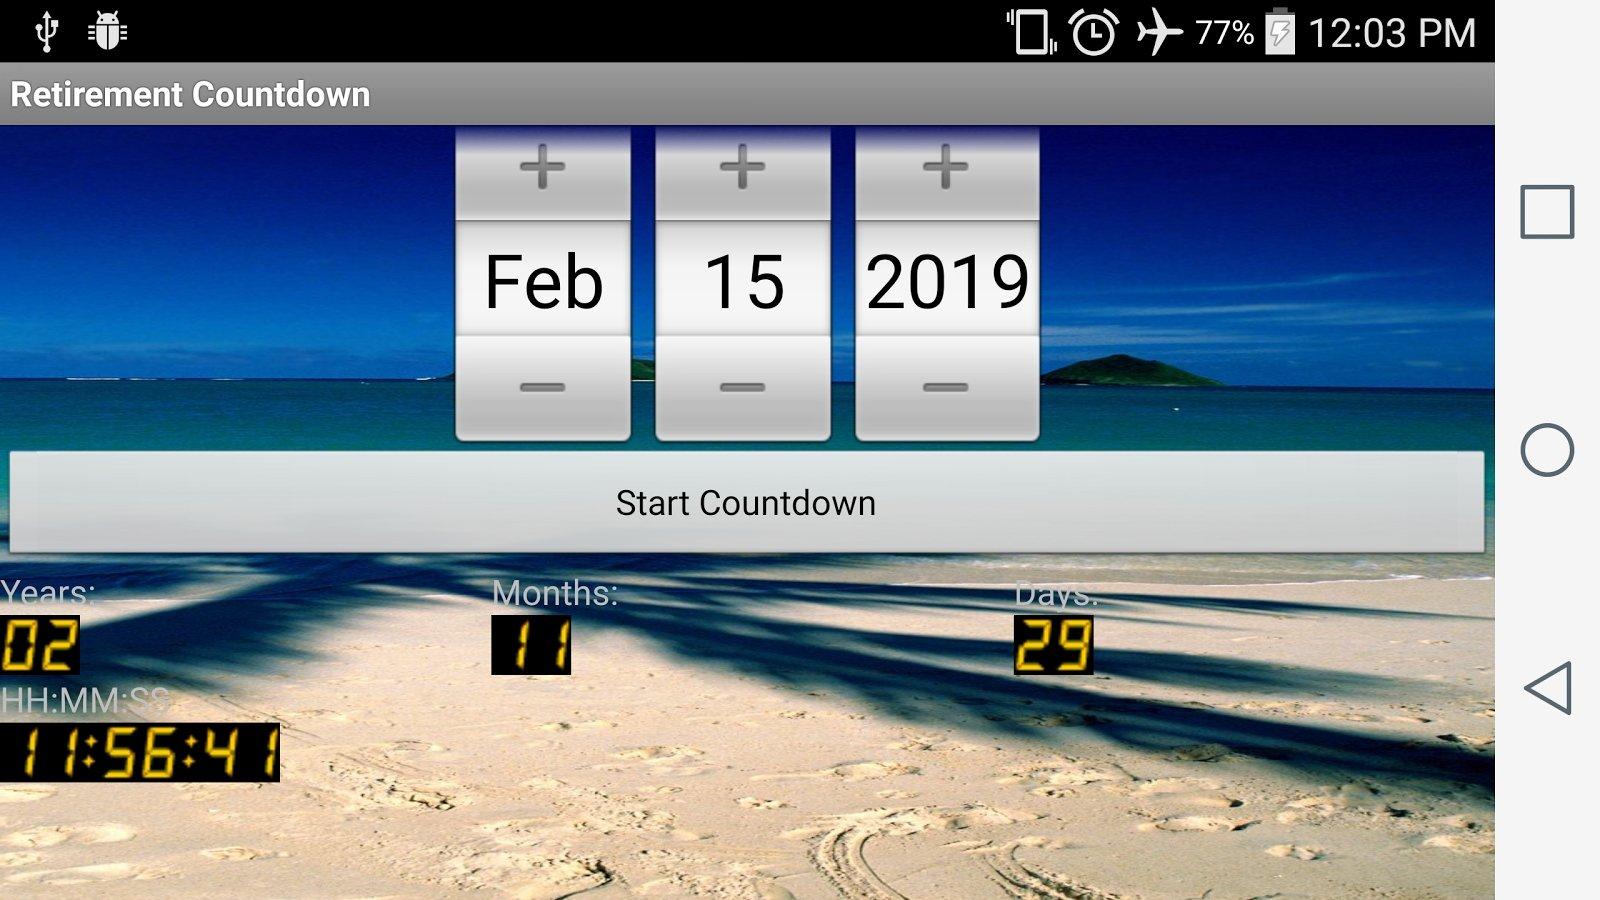 Short Timers Calendar Countdown Retirement : Free Calendar Military Short Timer Calendar